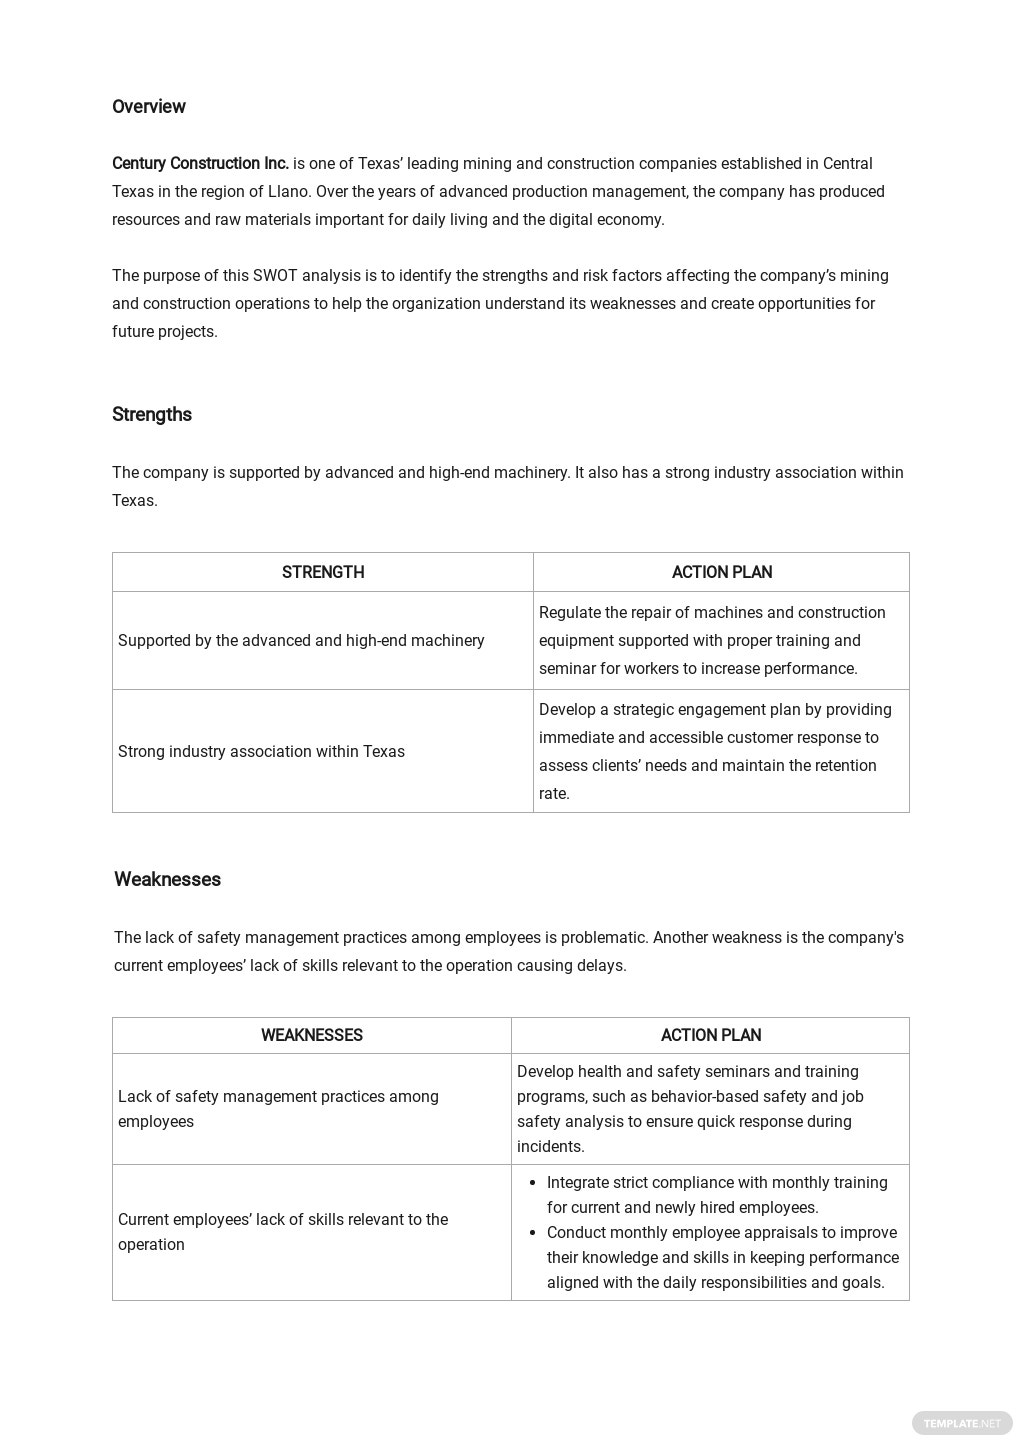 Mining & Construction Company SWOT Analysis Template 1.jpe